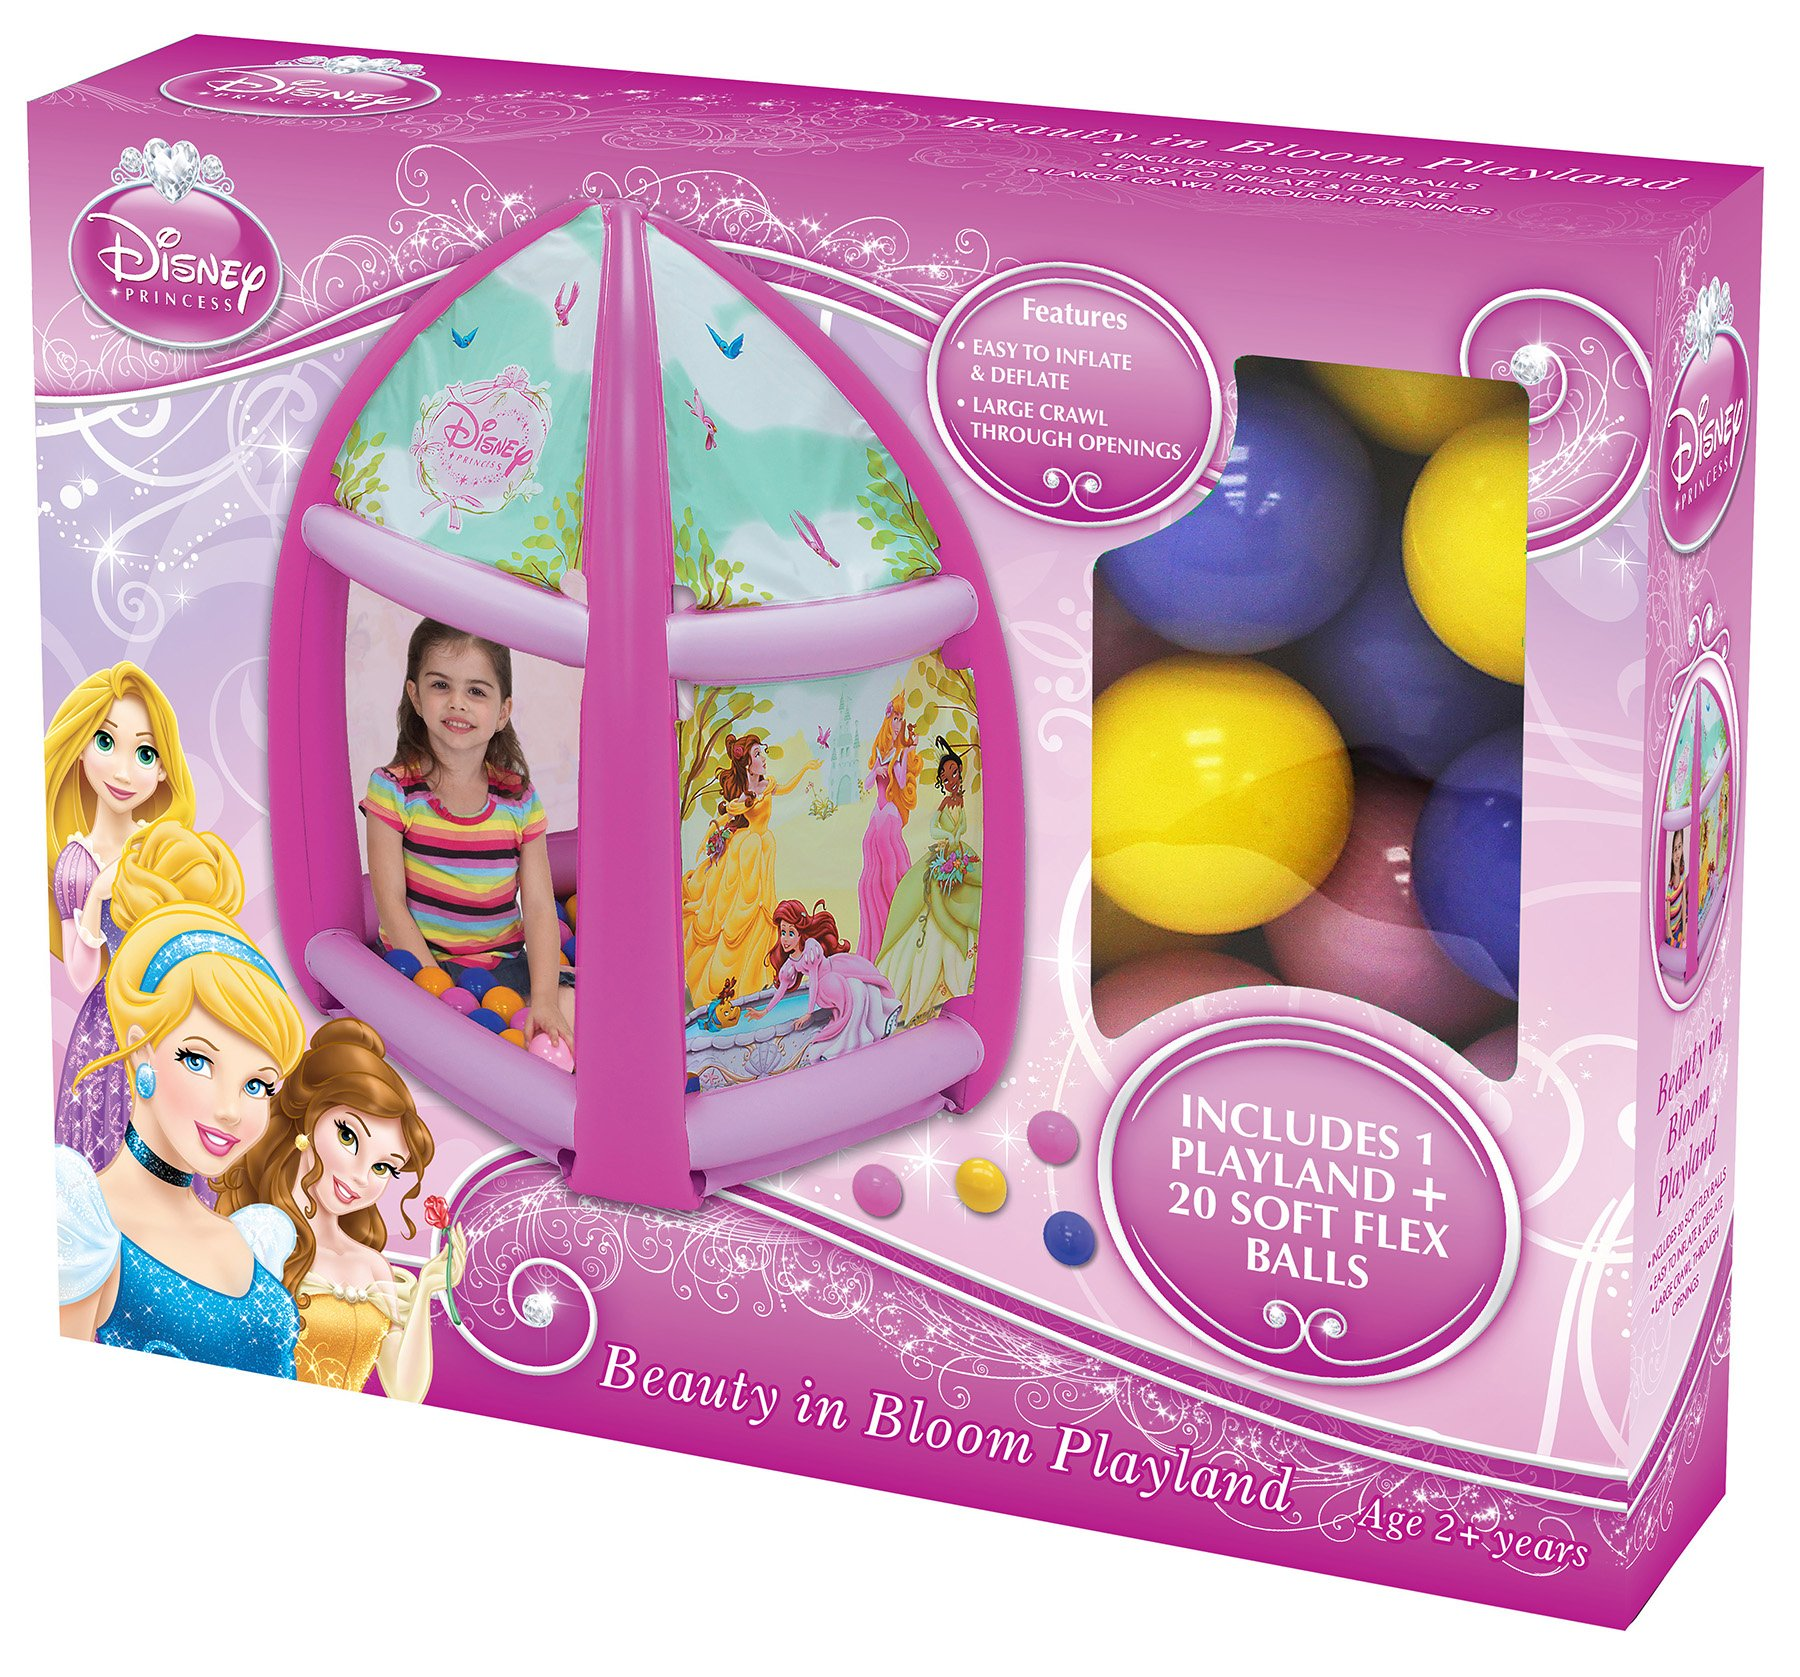 Disney Princess Beauty in Bloom Ball Pit, 1 Inflatable & 20 Sof-Flex Balls, Pink, 37'' W x 37'' D x 34'' H